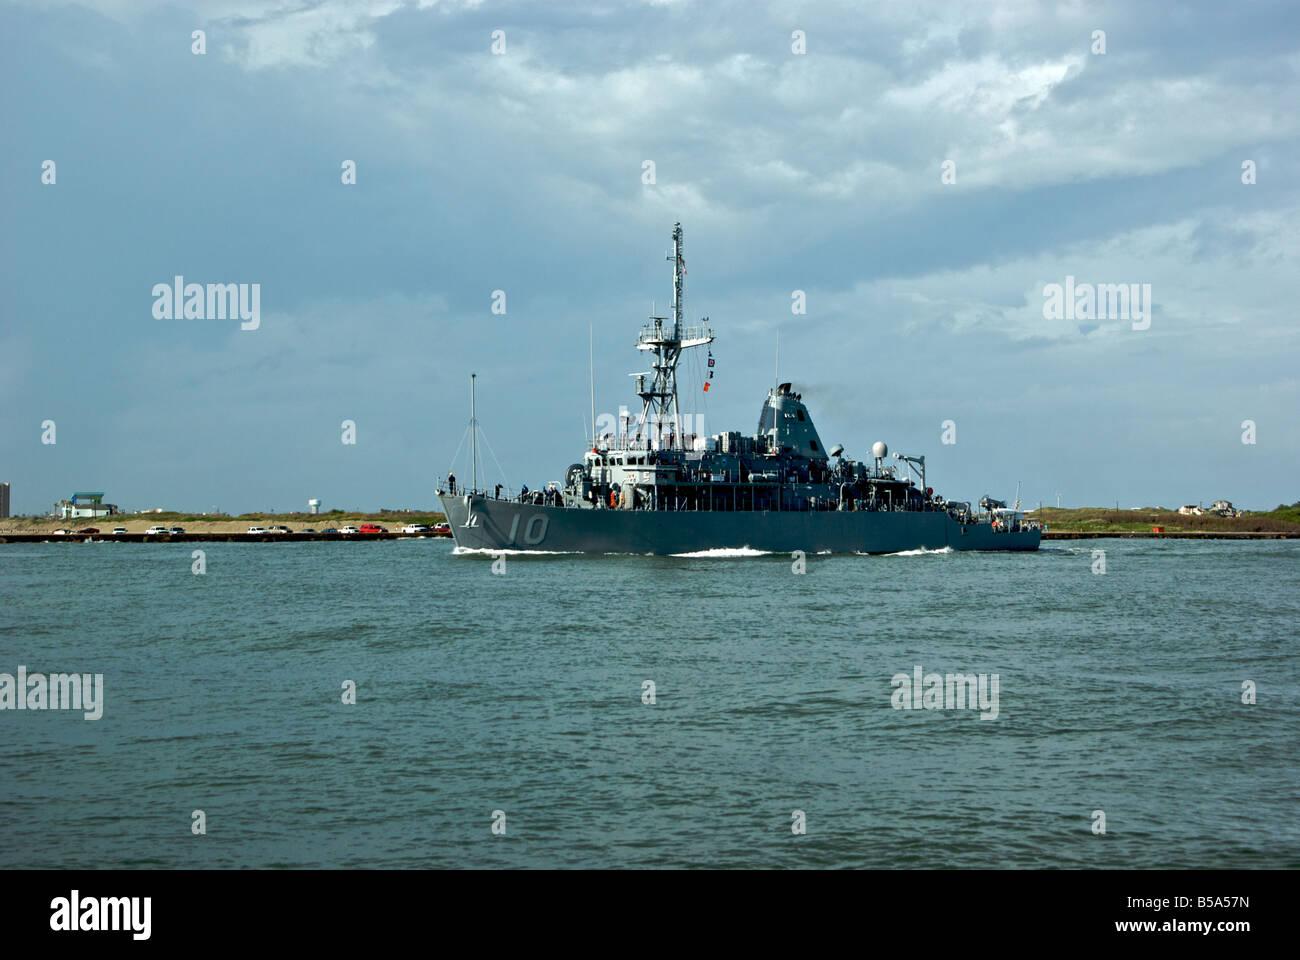 U S Navy naval war ship sailing into Gulf of Mexico from Port Aransas through Aransas Pass - Stock Image